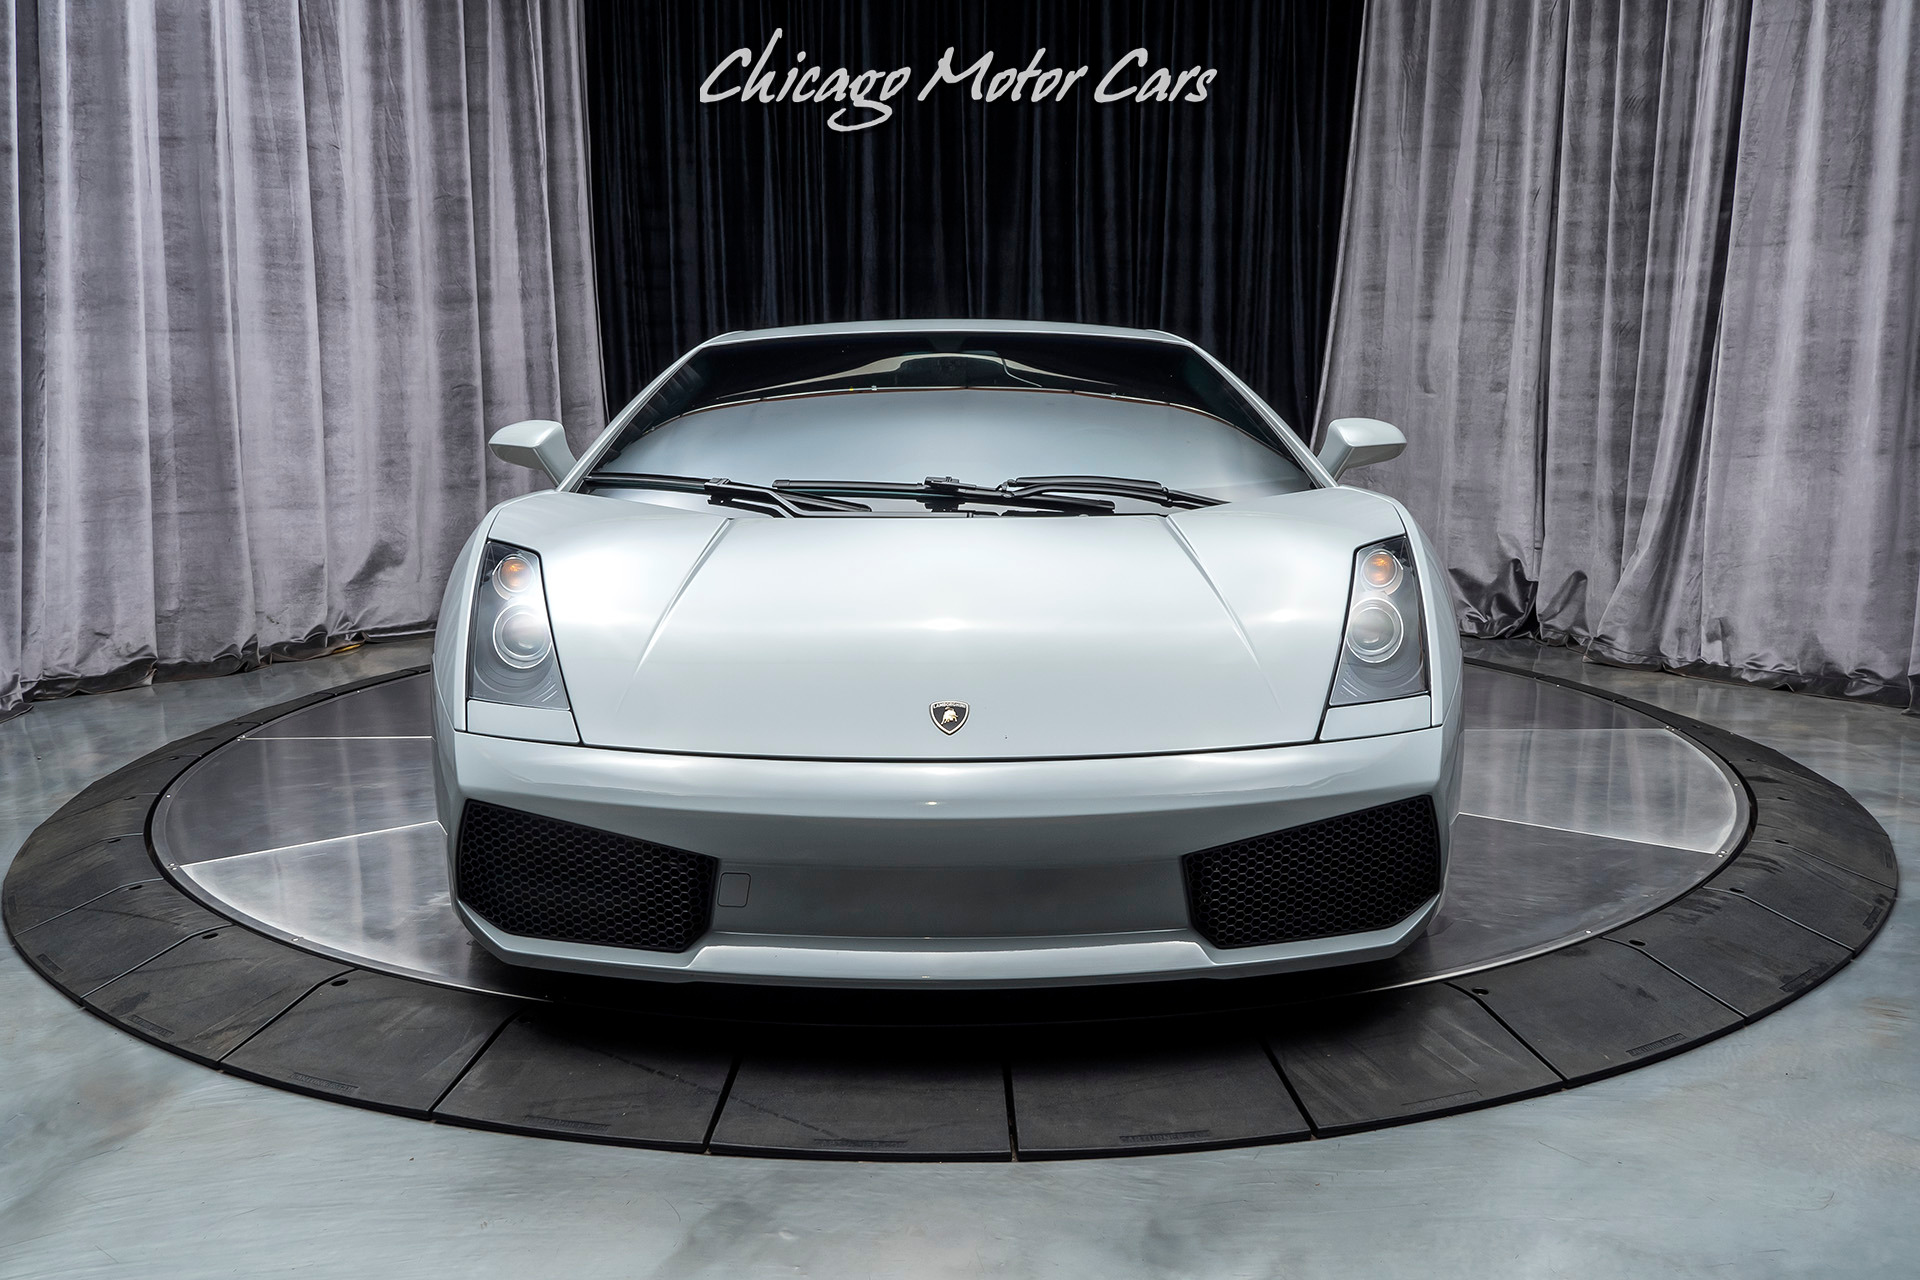 Used-2005-Lamborghini-Gallardo-Twin-Turbo-6-Spd-Manual-12-MILE-WORLD-RECORD-HOLDER-22659-MPH